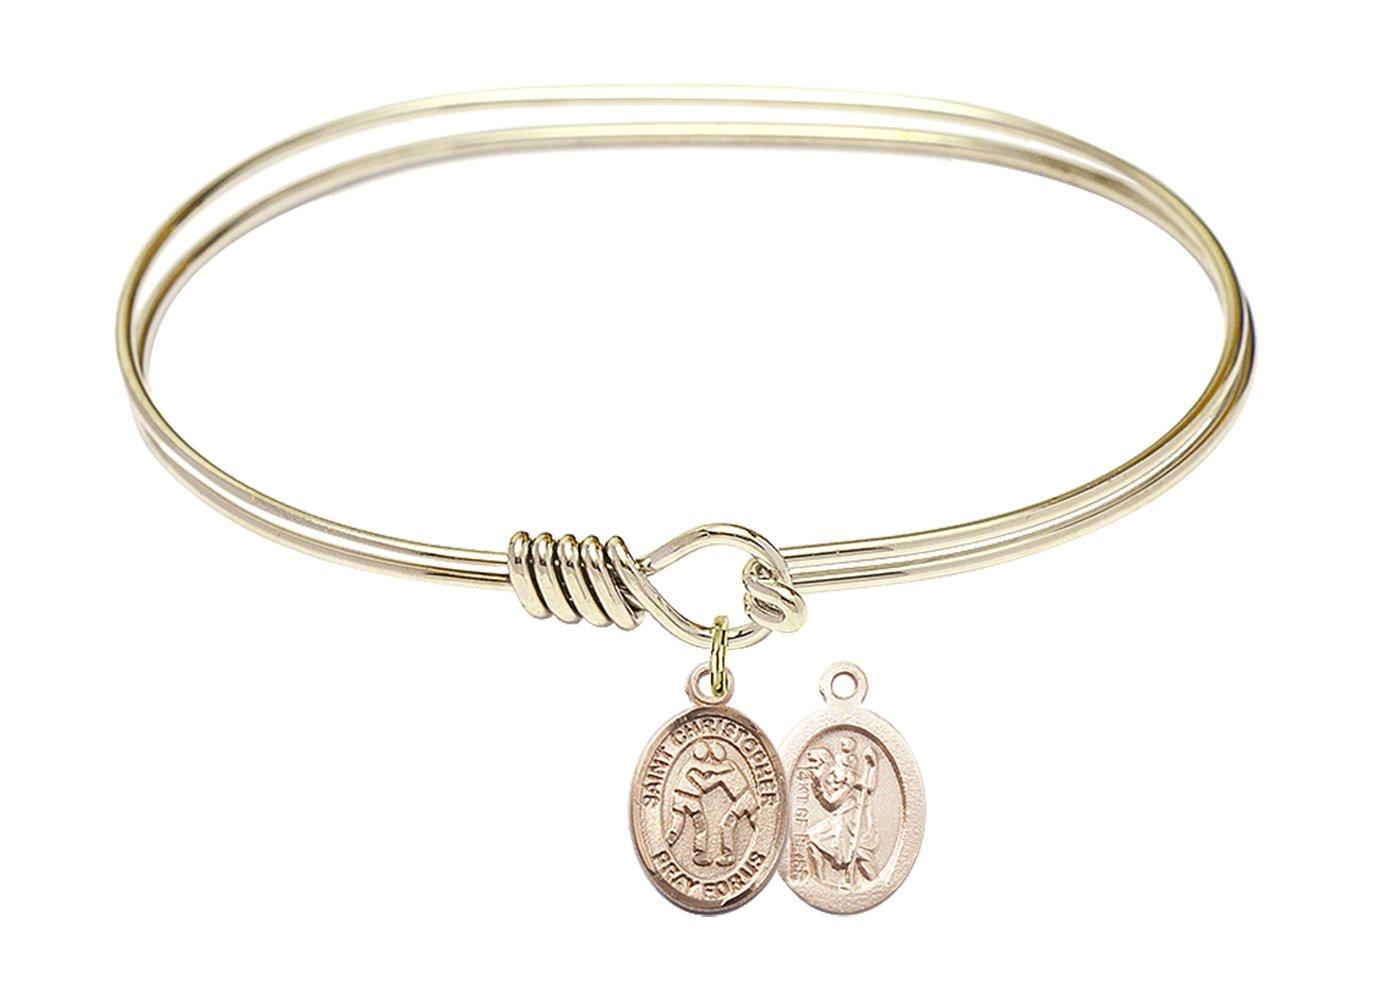 St. Christopher Wrestling Charm On A 7 Inch Oval Eye Hook Bangle Bracelet by Catholic Saint Medals